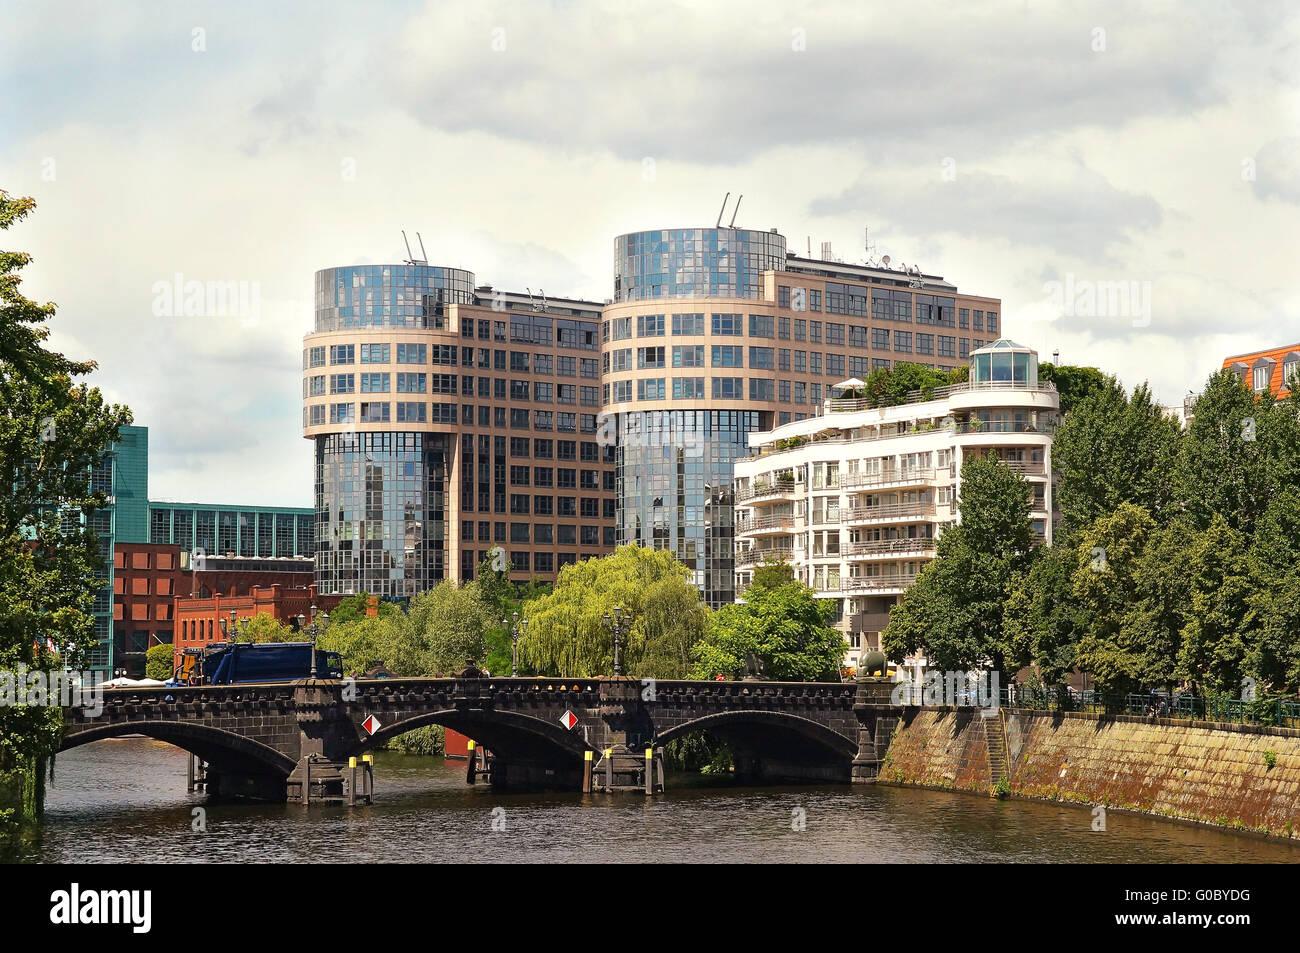 Interior Ministry Berlin Germany - Stock Image